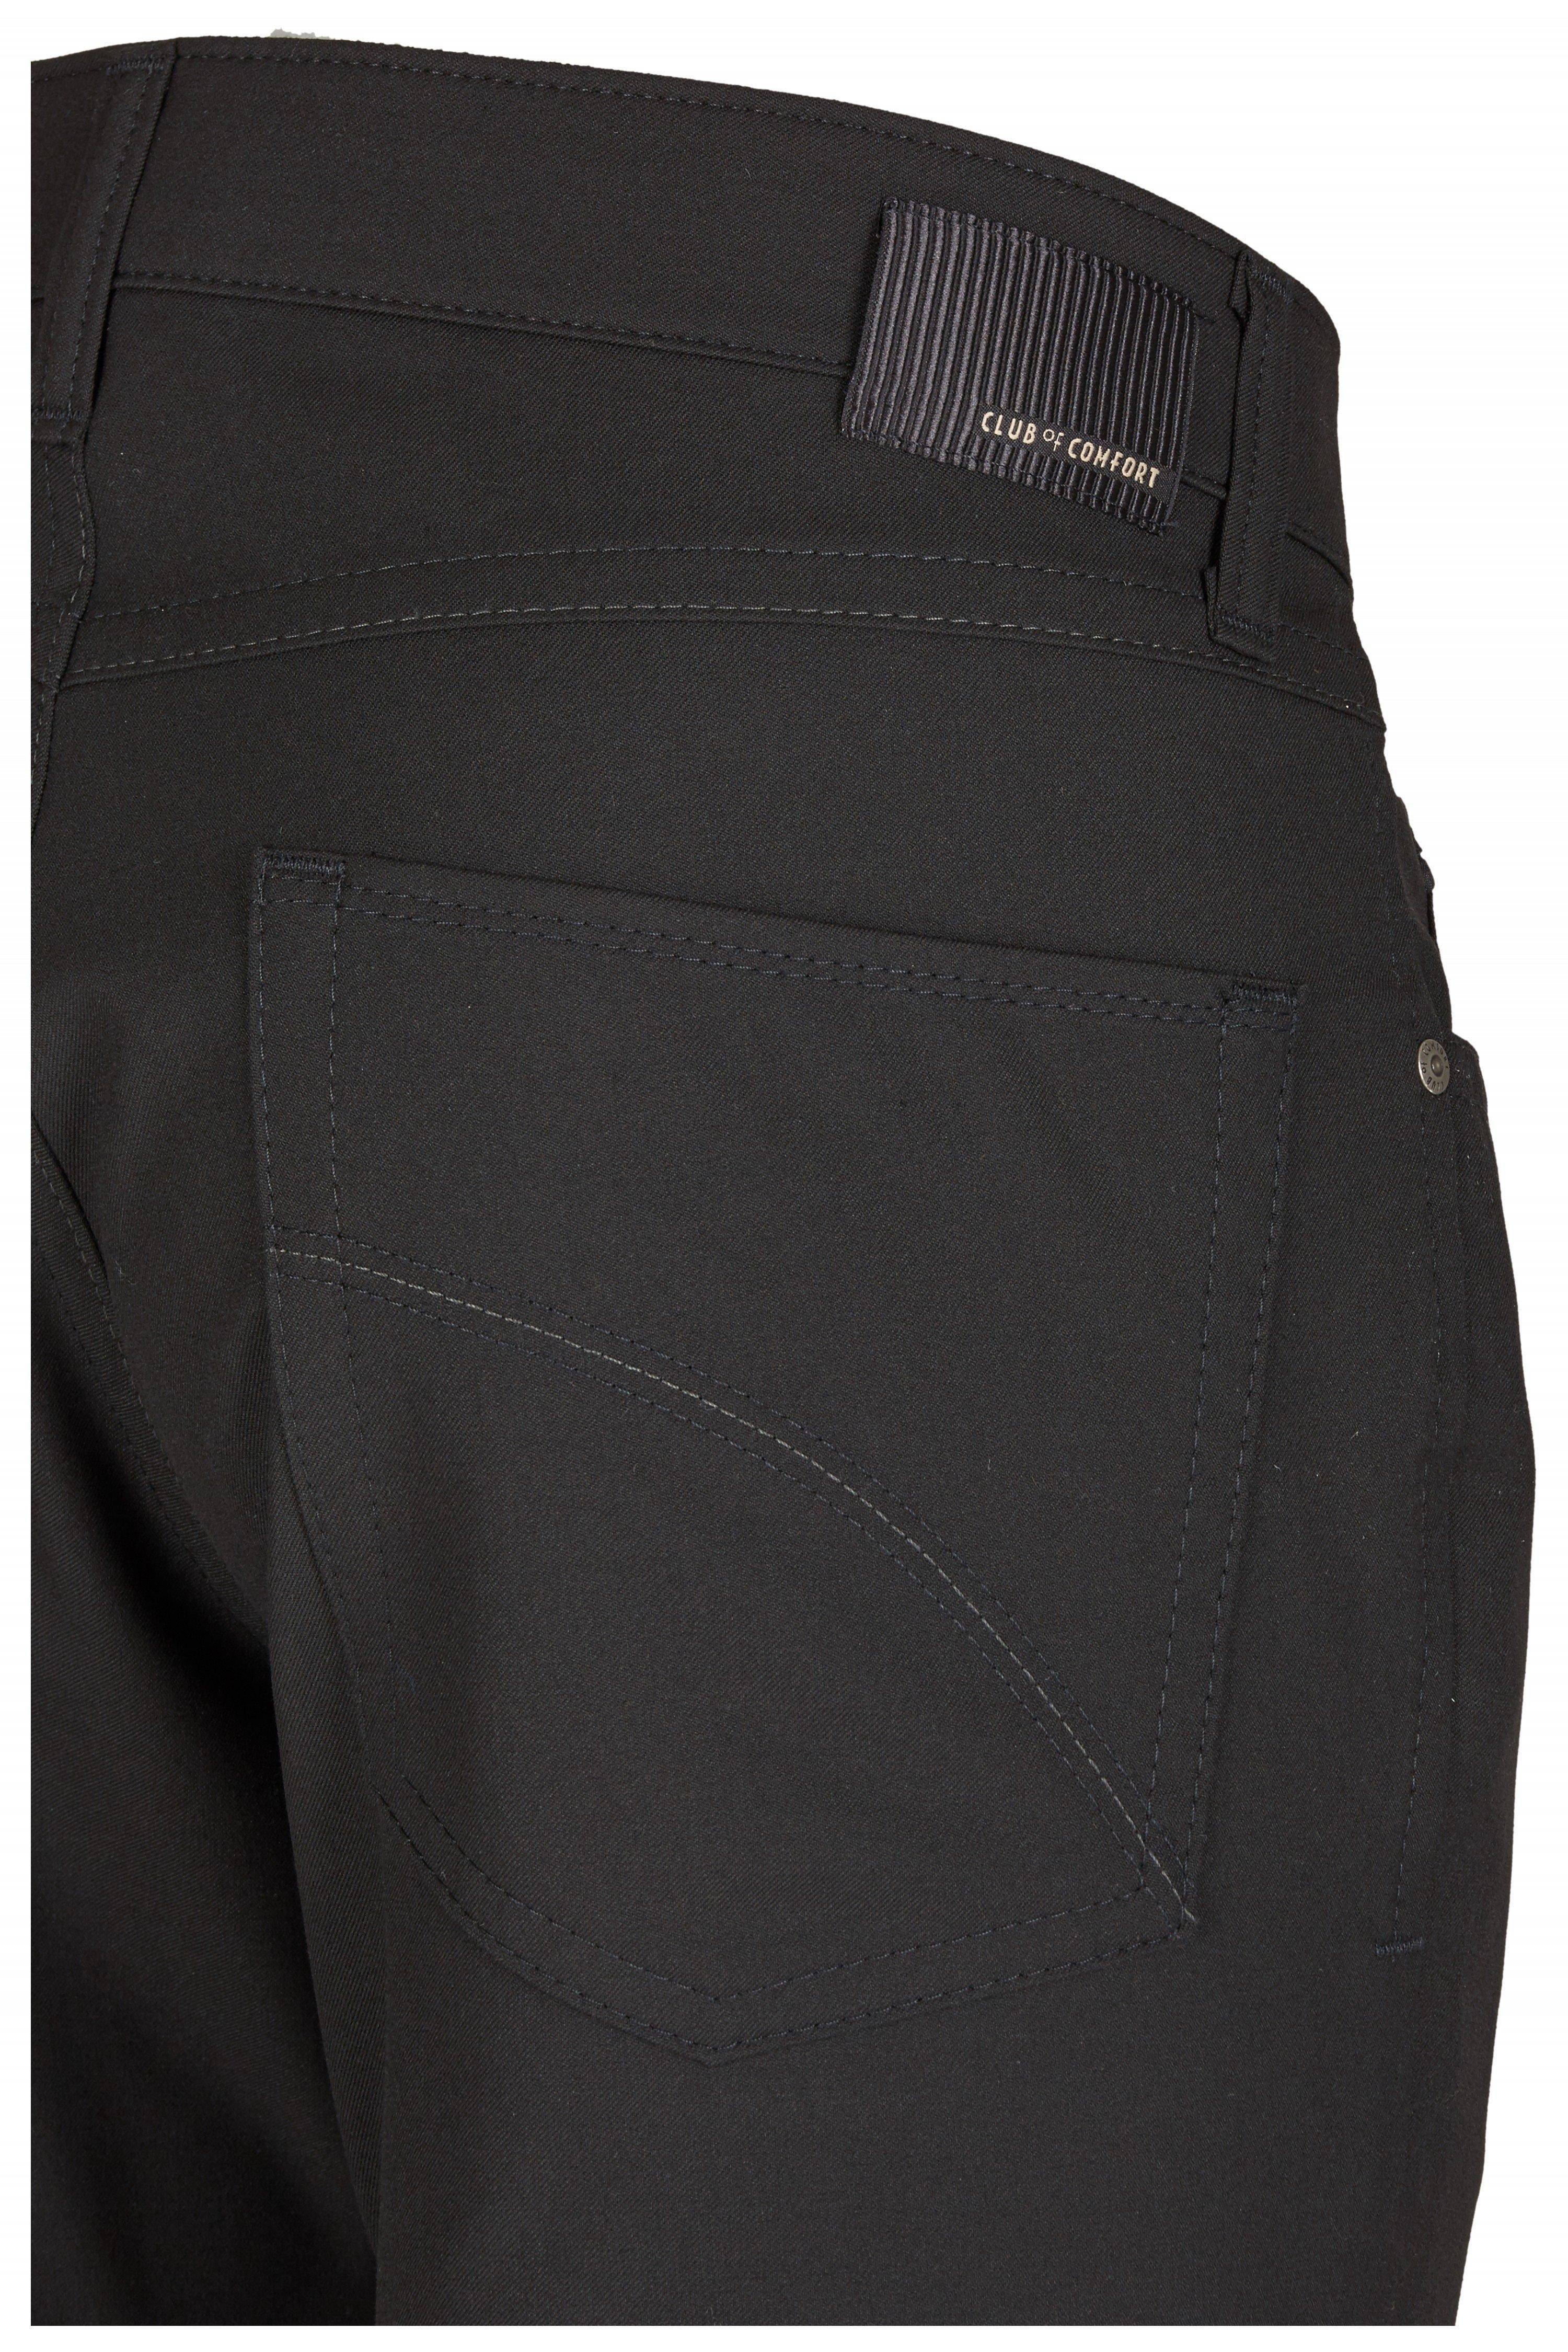 Makkelijk Gekocht Club Of Comfort Jeans f6gyYb7v